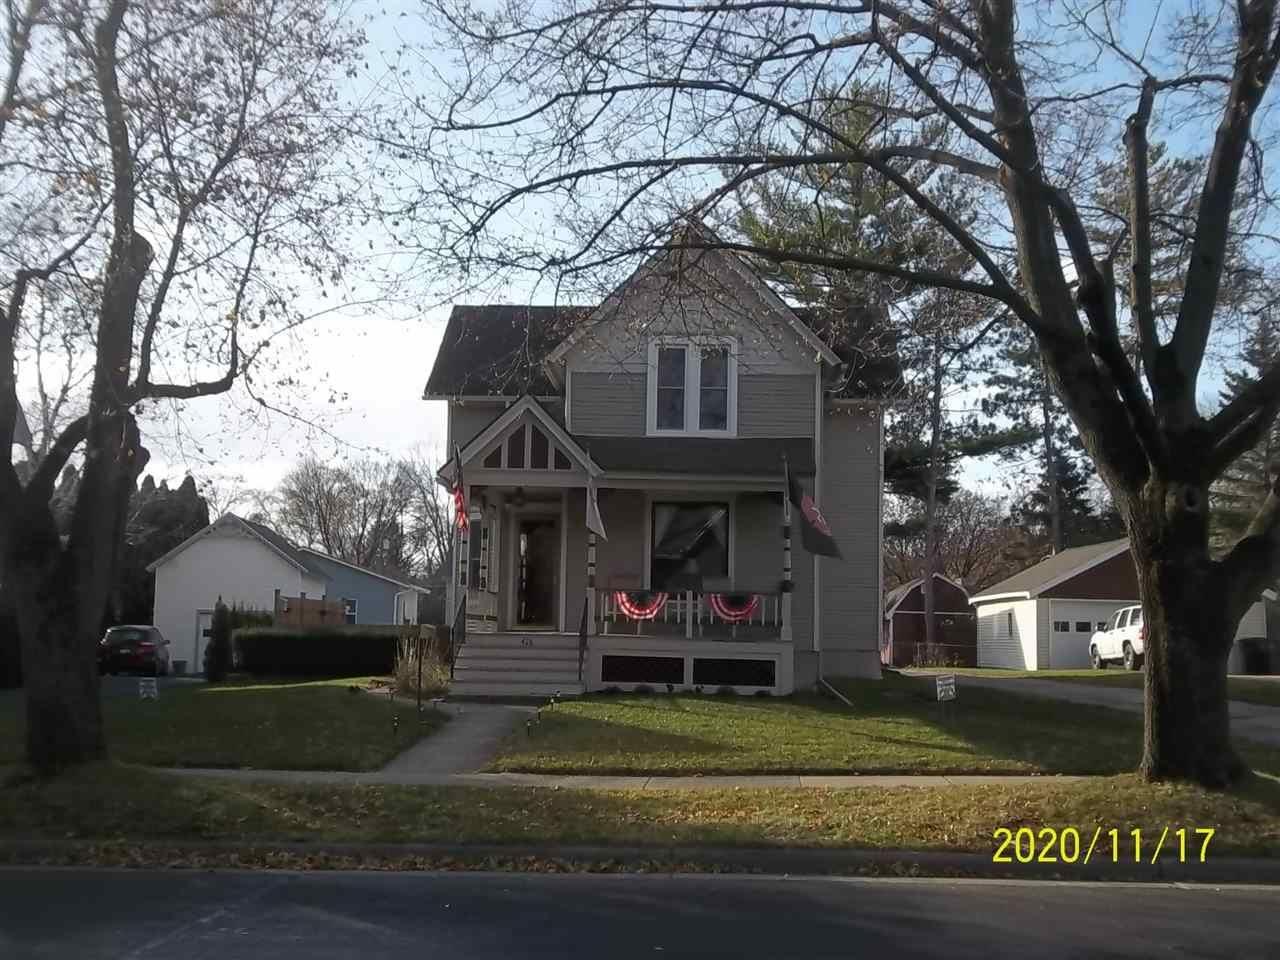 426 E Lake St, Lake Mills, WI 53551 - MLS#: 1897599